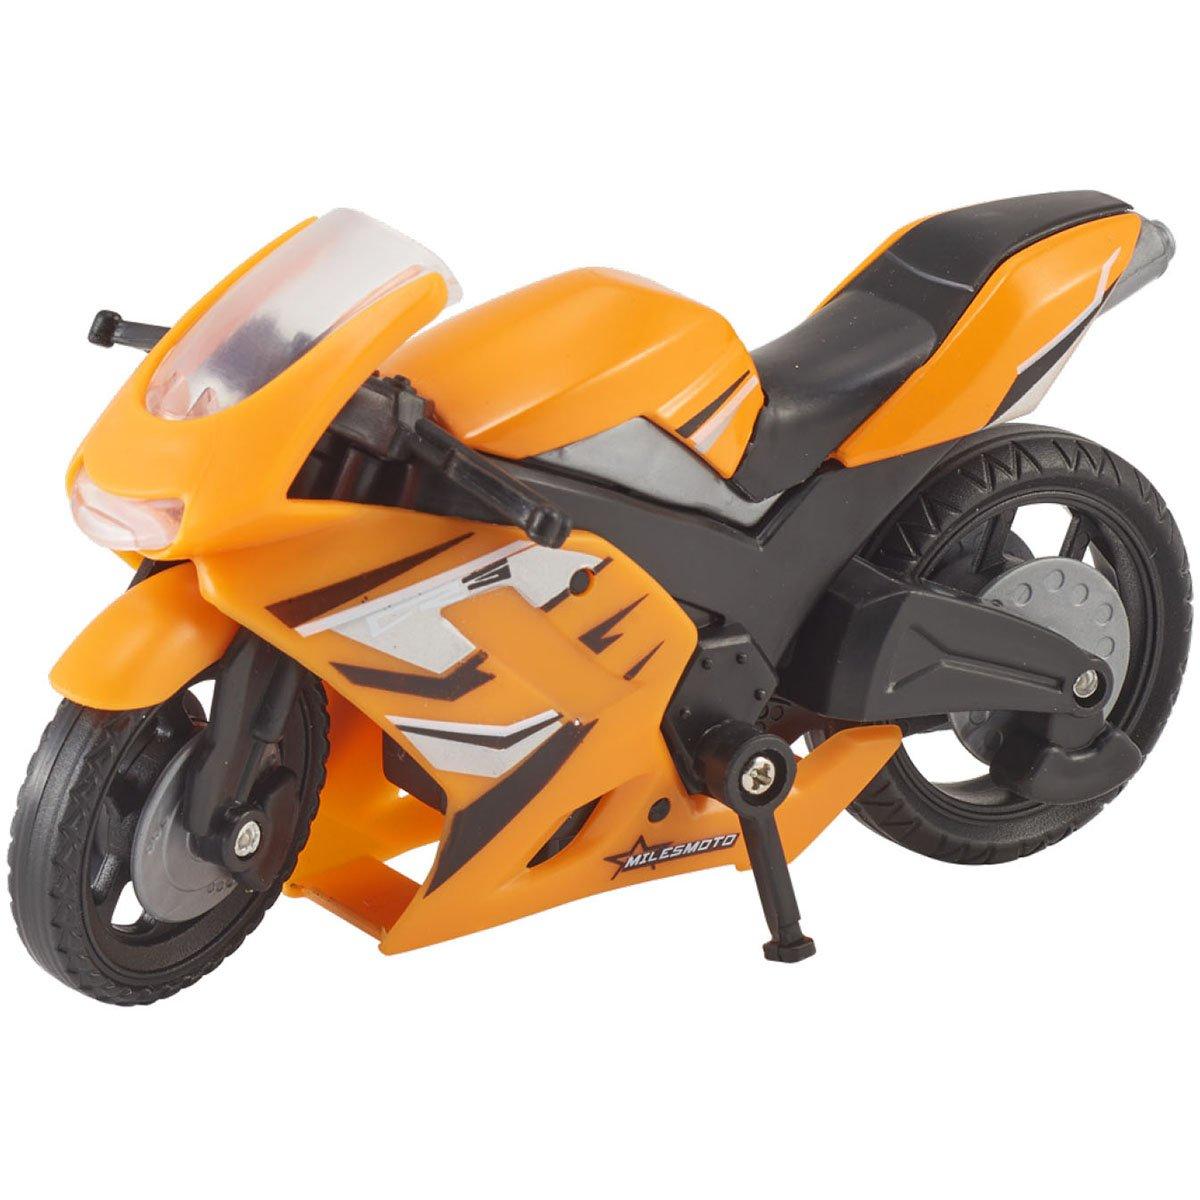 Motocicleta Teamsterz Speed Bike, Portocaliu imagine